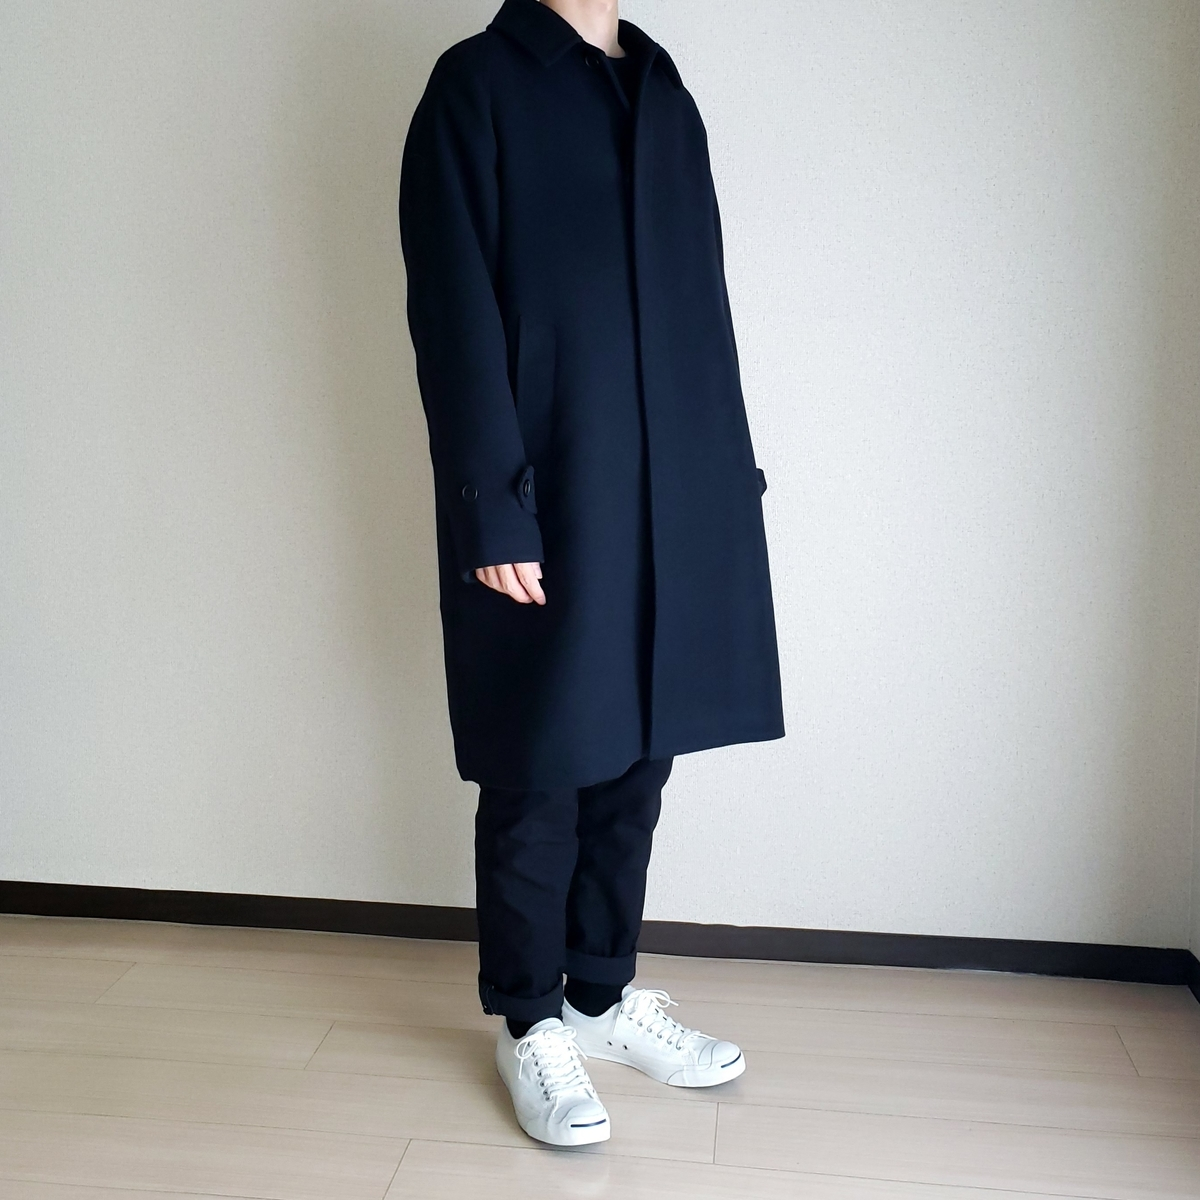 f:id:hihowru:20210208142405j:plain